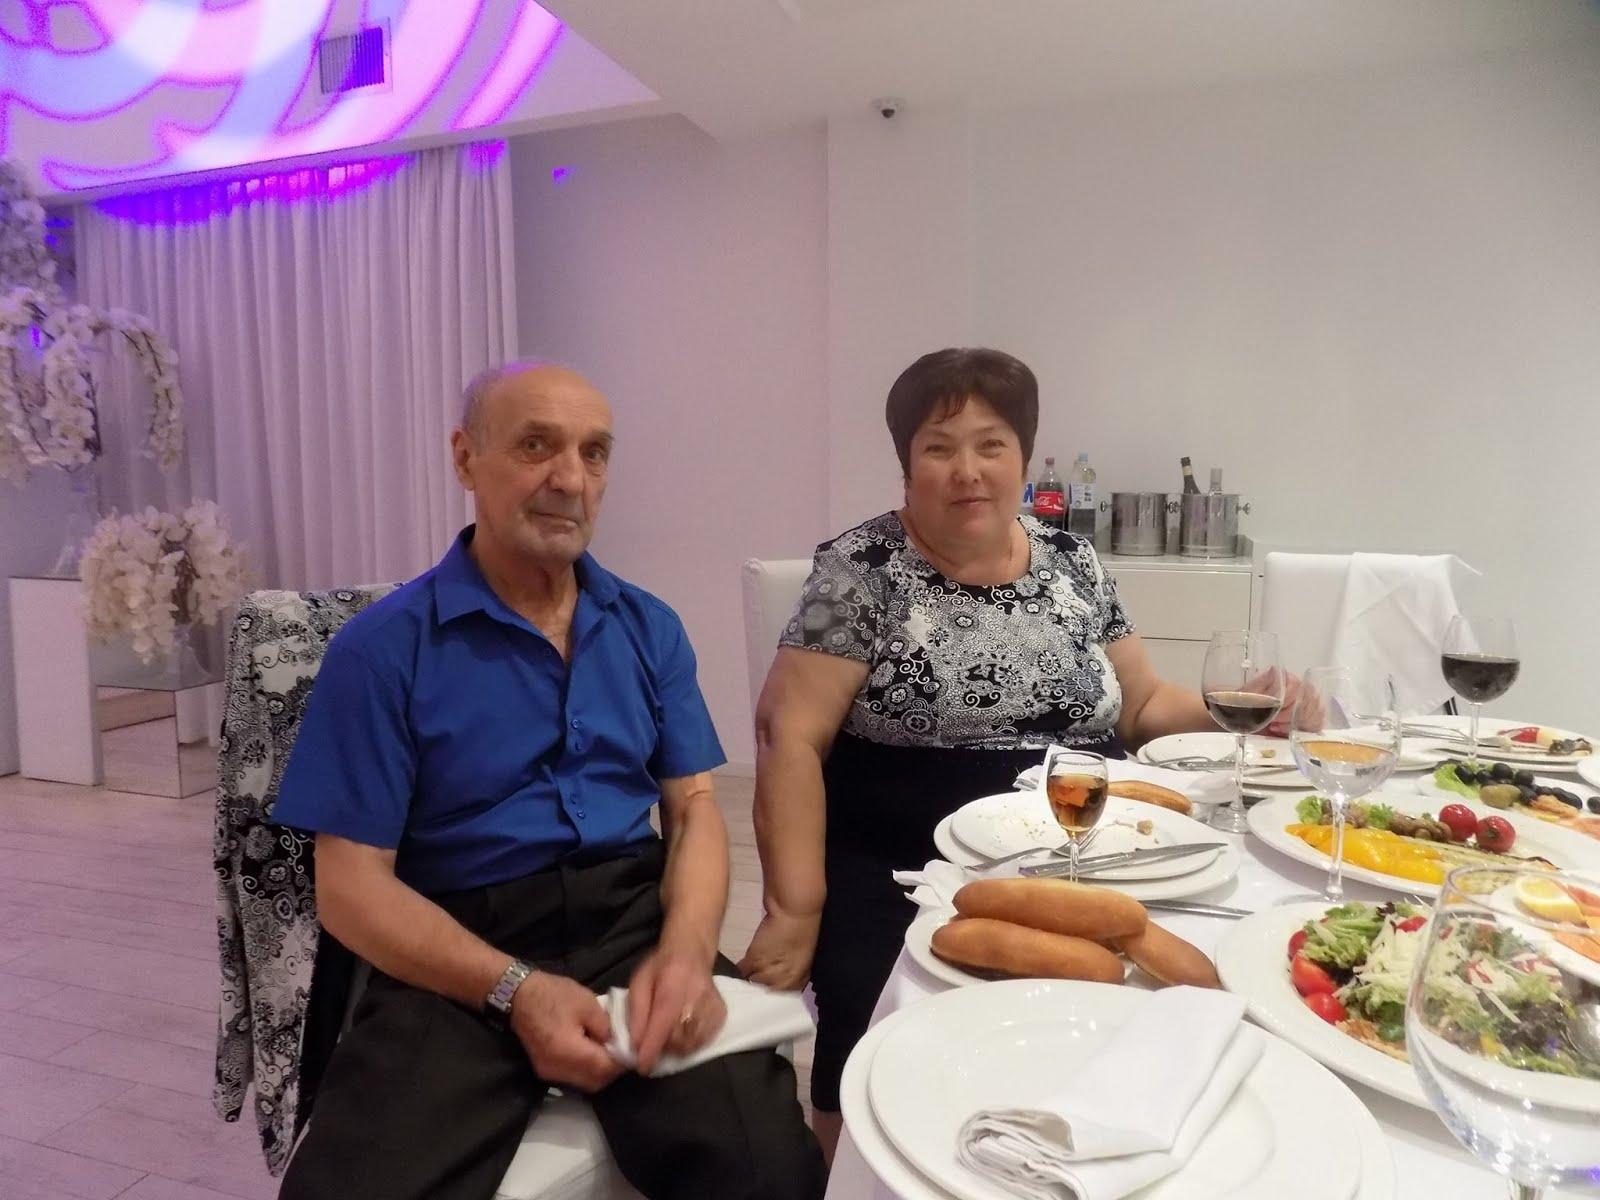 Valentina et Boris Vatav le cousin de mon père Chisinau Moldova 2015